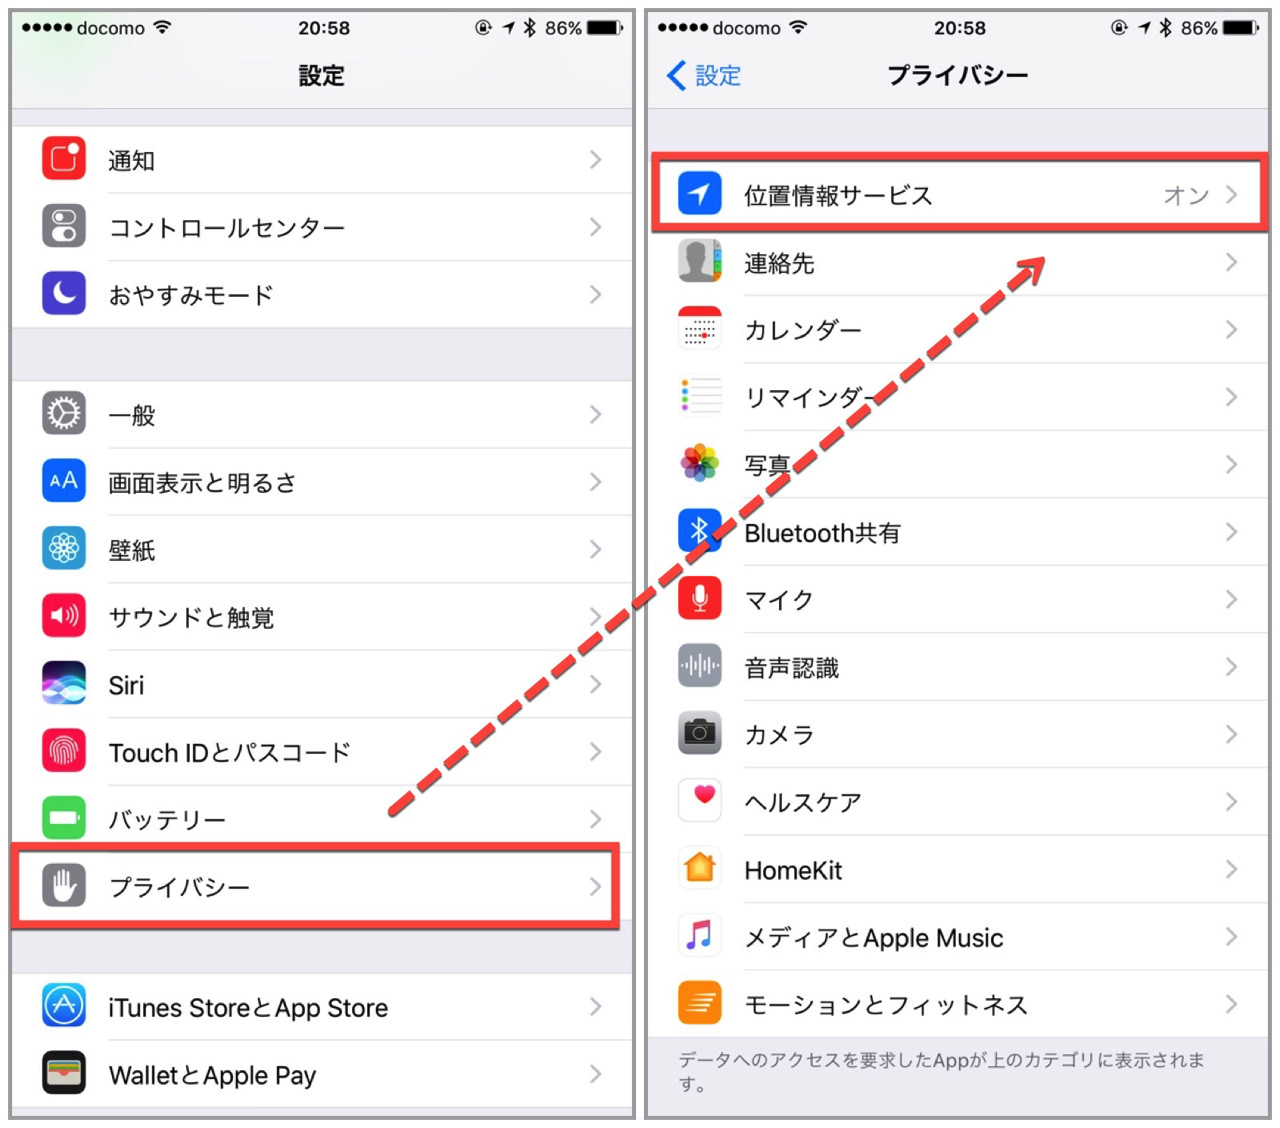 Iphone wifi 5ghz3